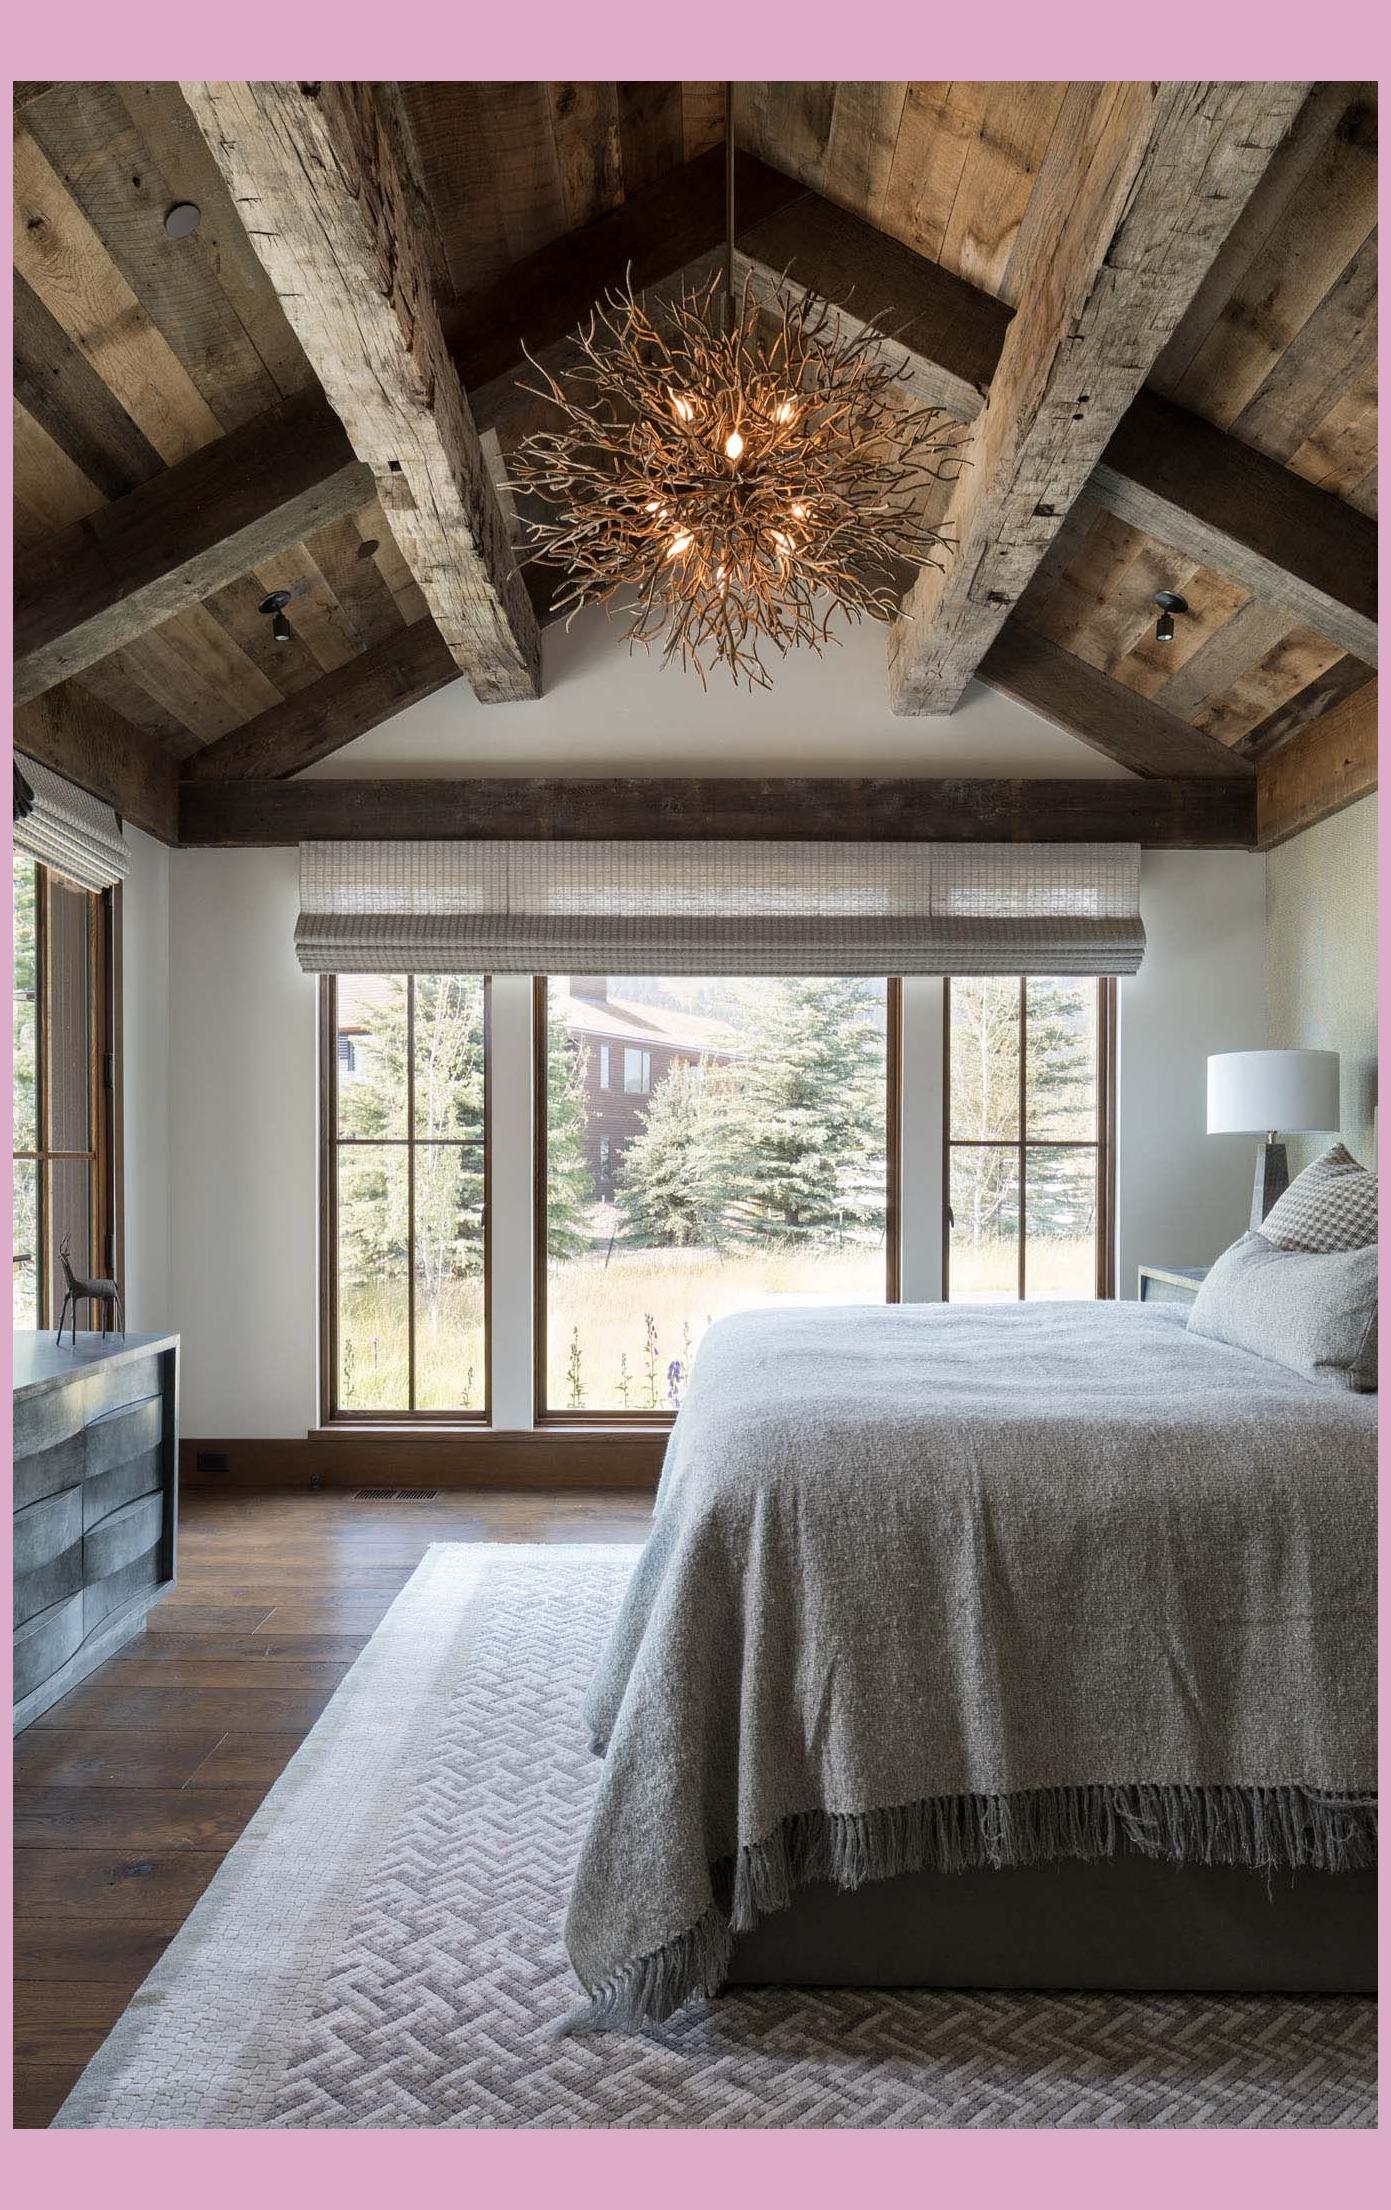 Folding Dining Room 738165 Smart Furniture Ideas Smartfurnitureideas With City Populations Growi In 2020 Rustic Home Design Living Room Decor Rustic Rustic House